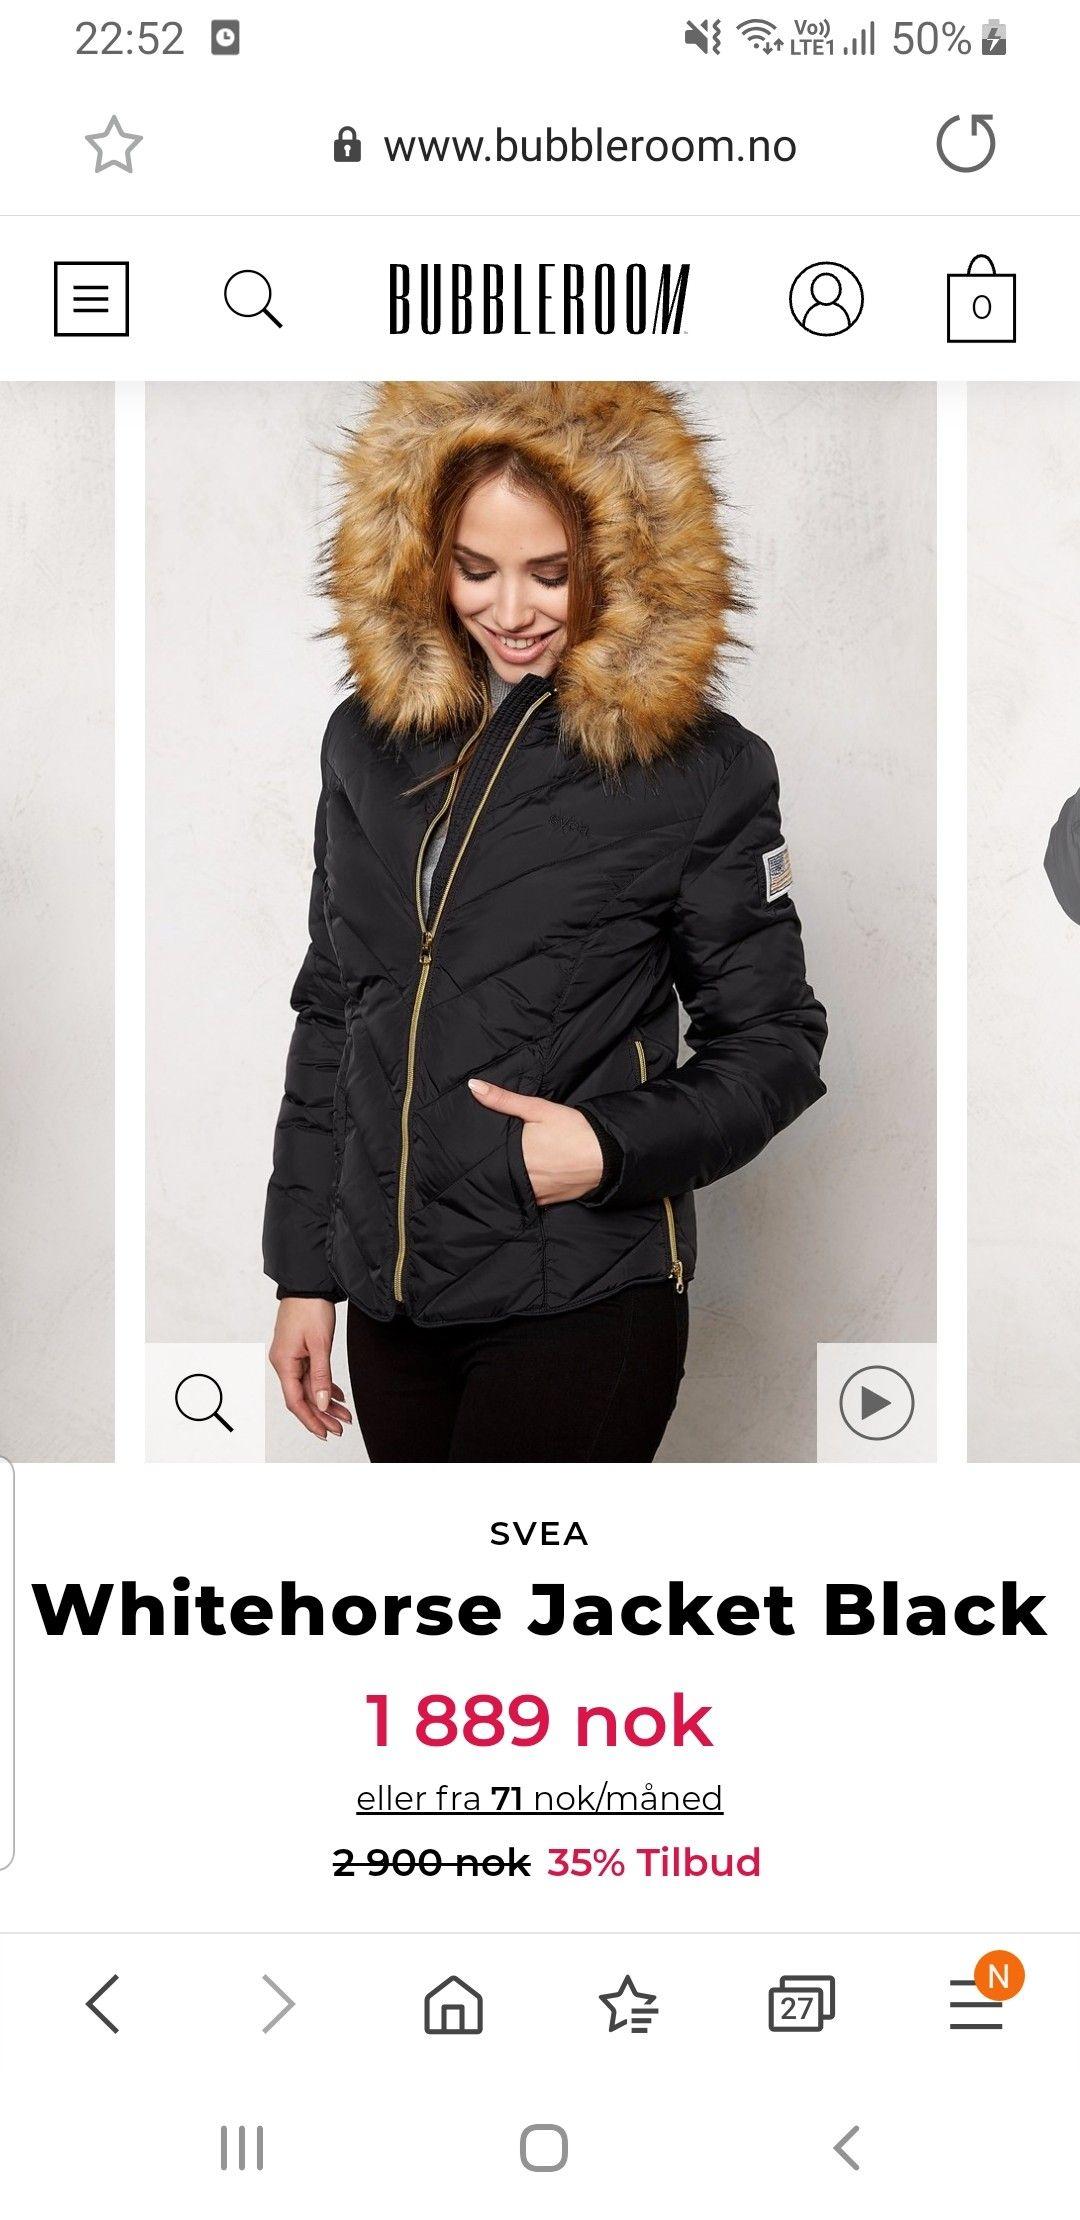 Svea Whitehorse Jacket Black Bubbleroom